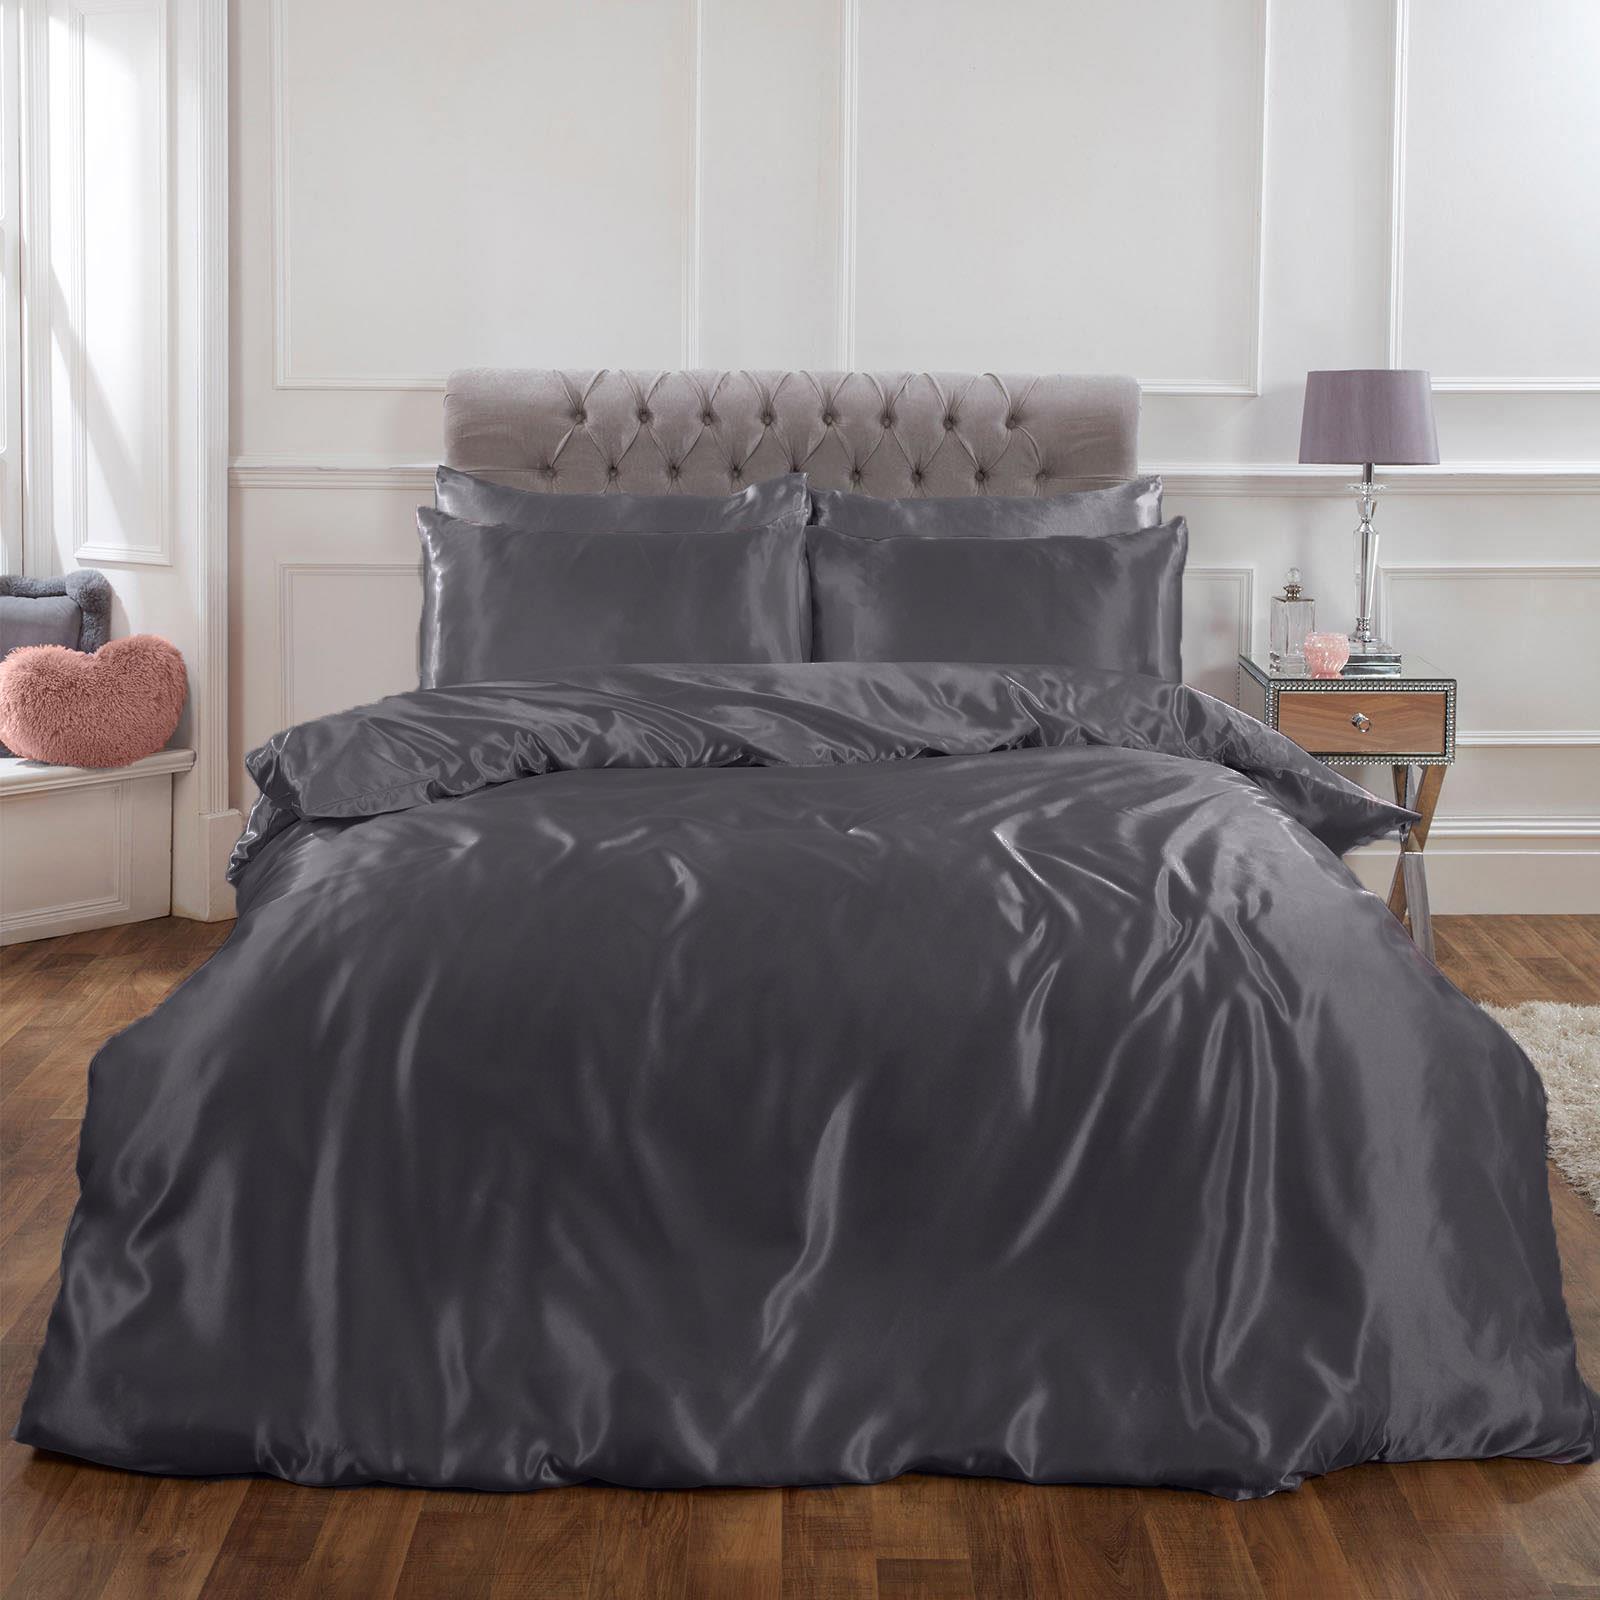 thumbnail 25 - Sienna Satin Silk Duvet Cover with Pillowcases Bedding Set, Blush Pink Silver